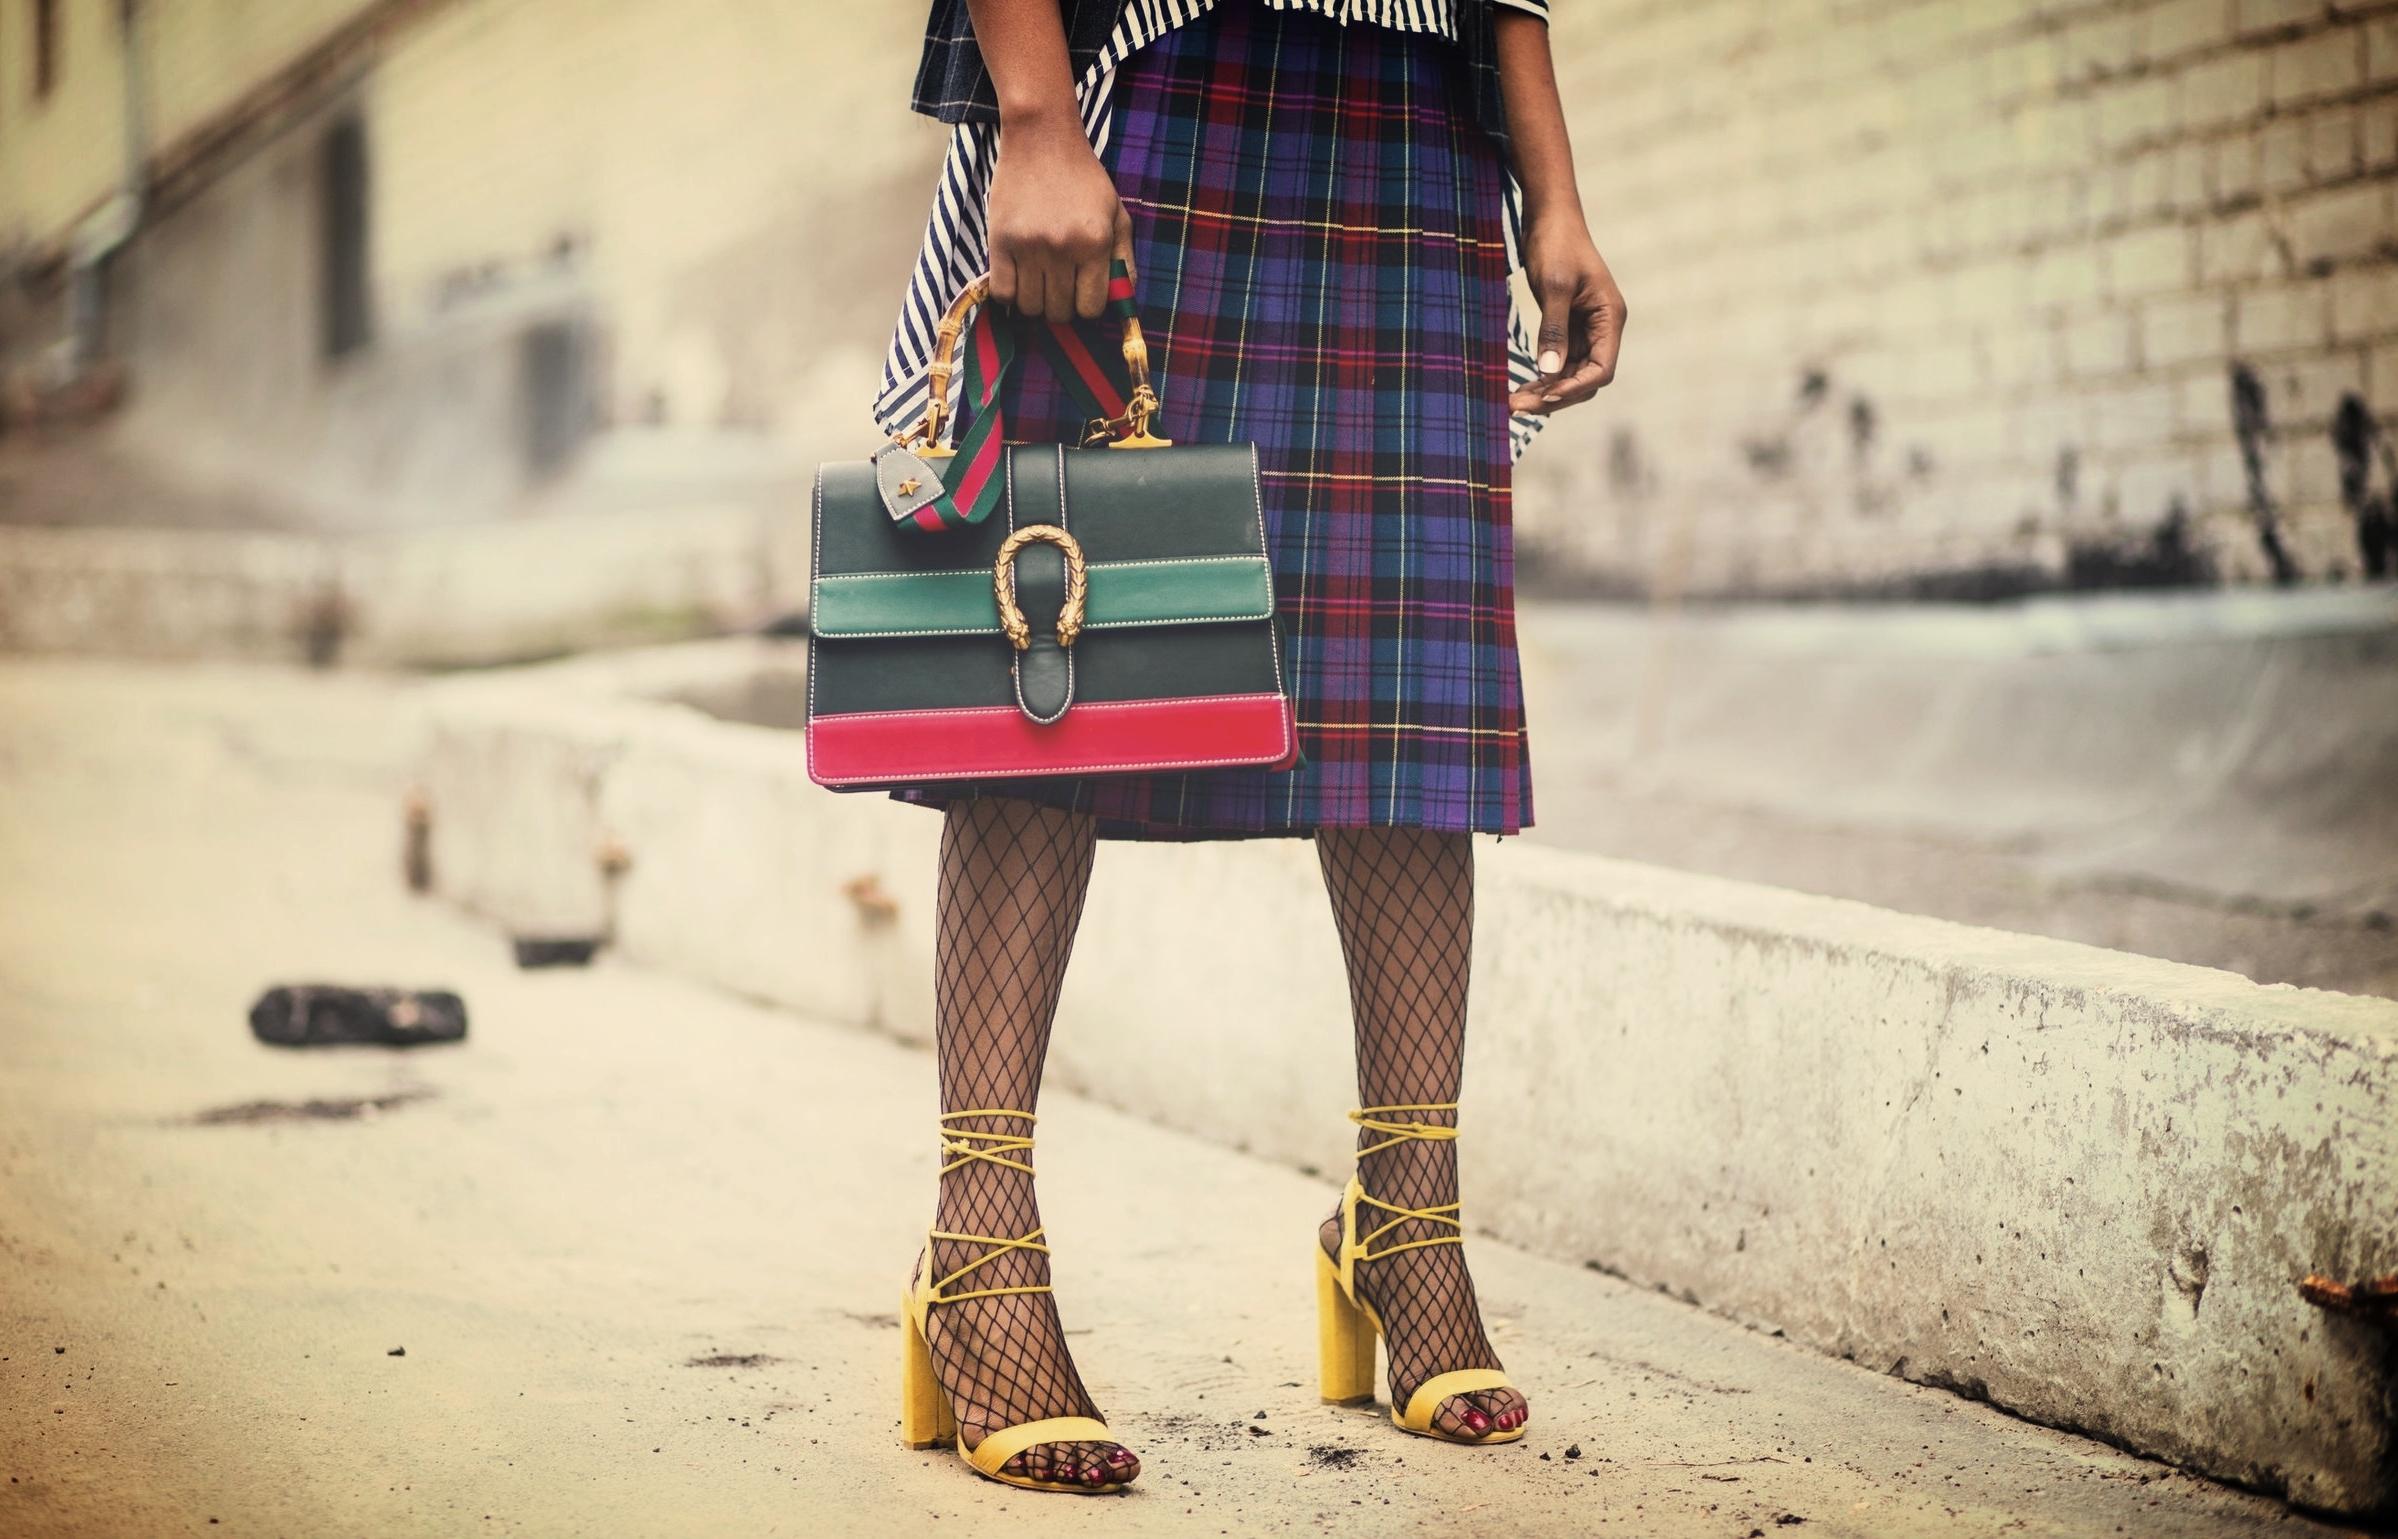 rsz_bag-blazers-clothing-932401.jpg